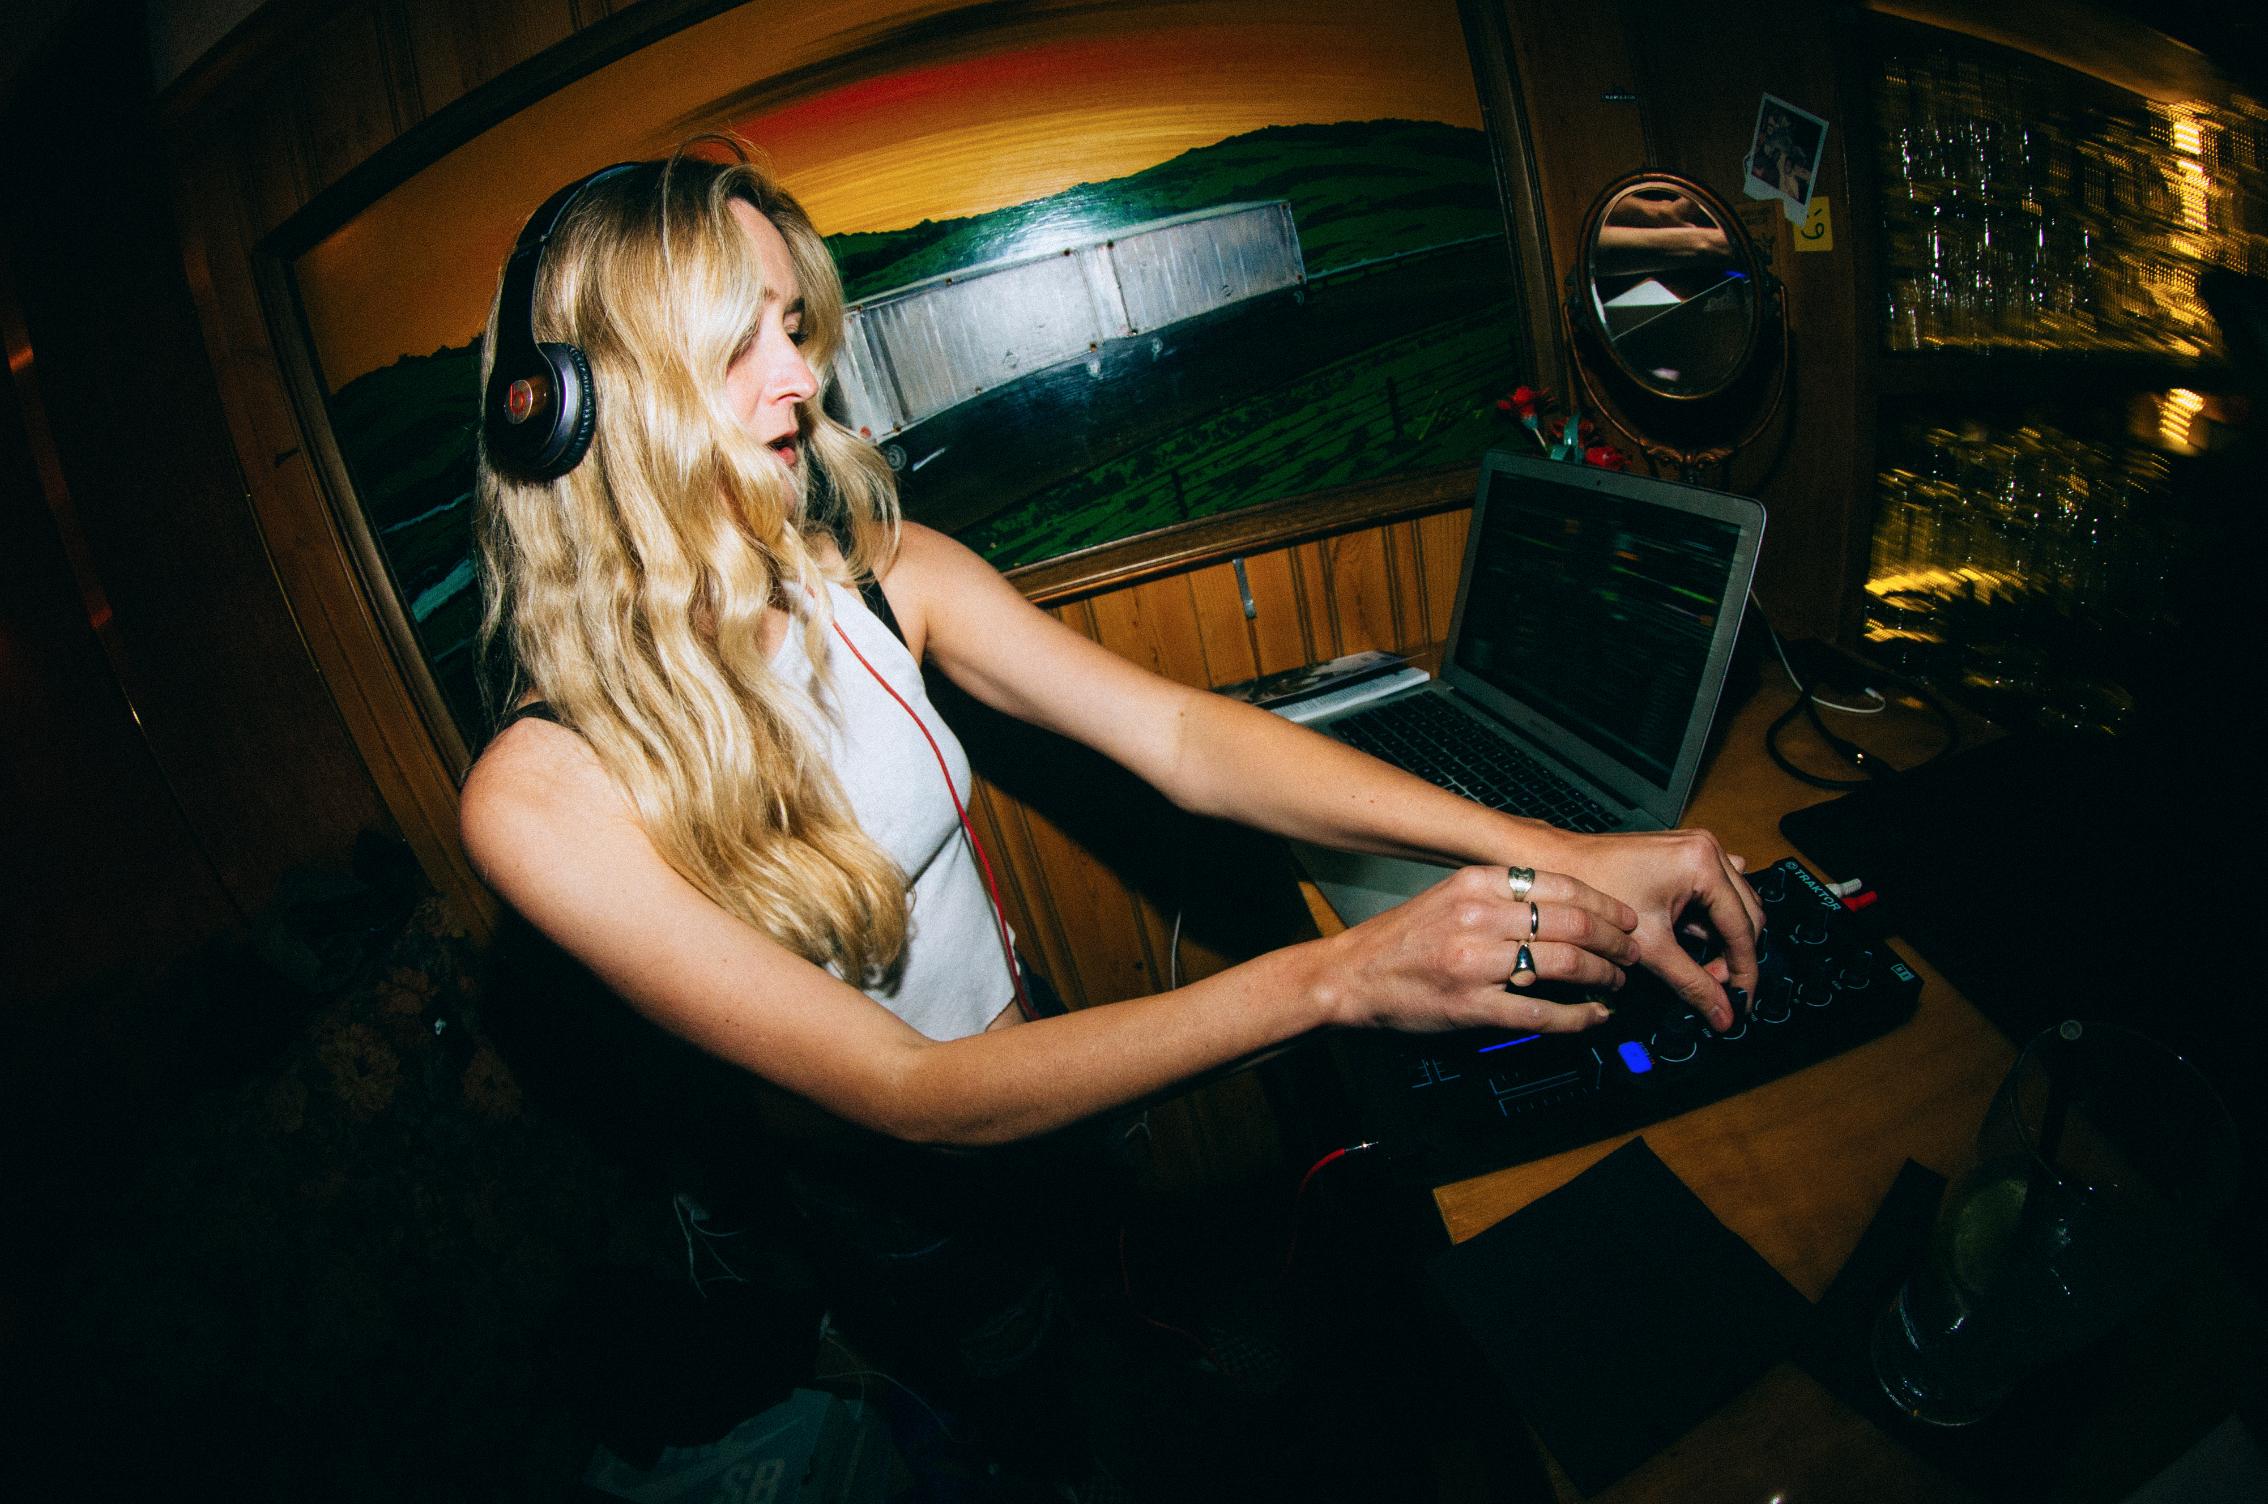 The world's longest DJ, Carli Nicholas